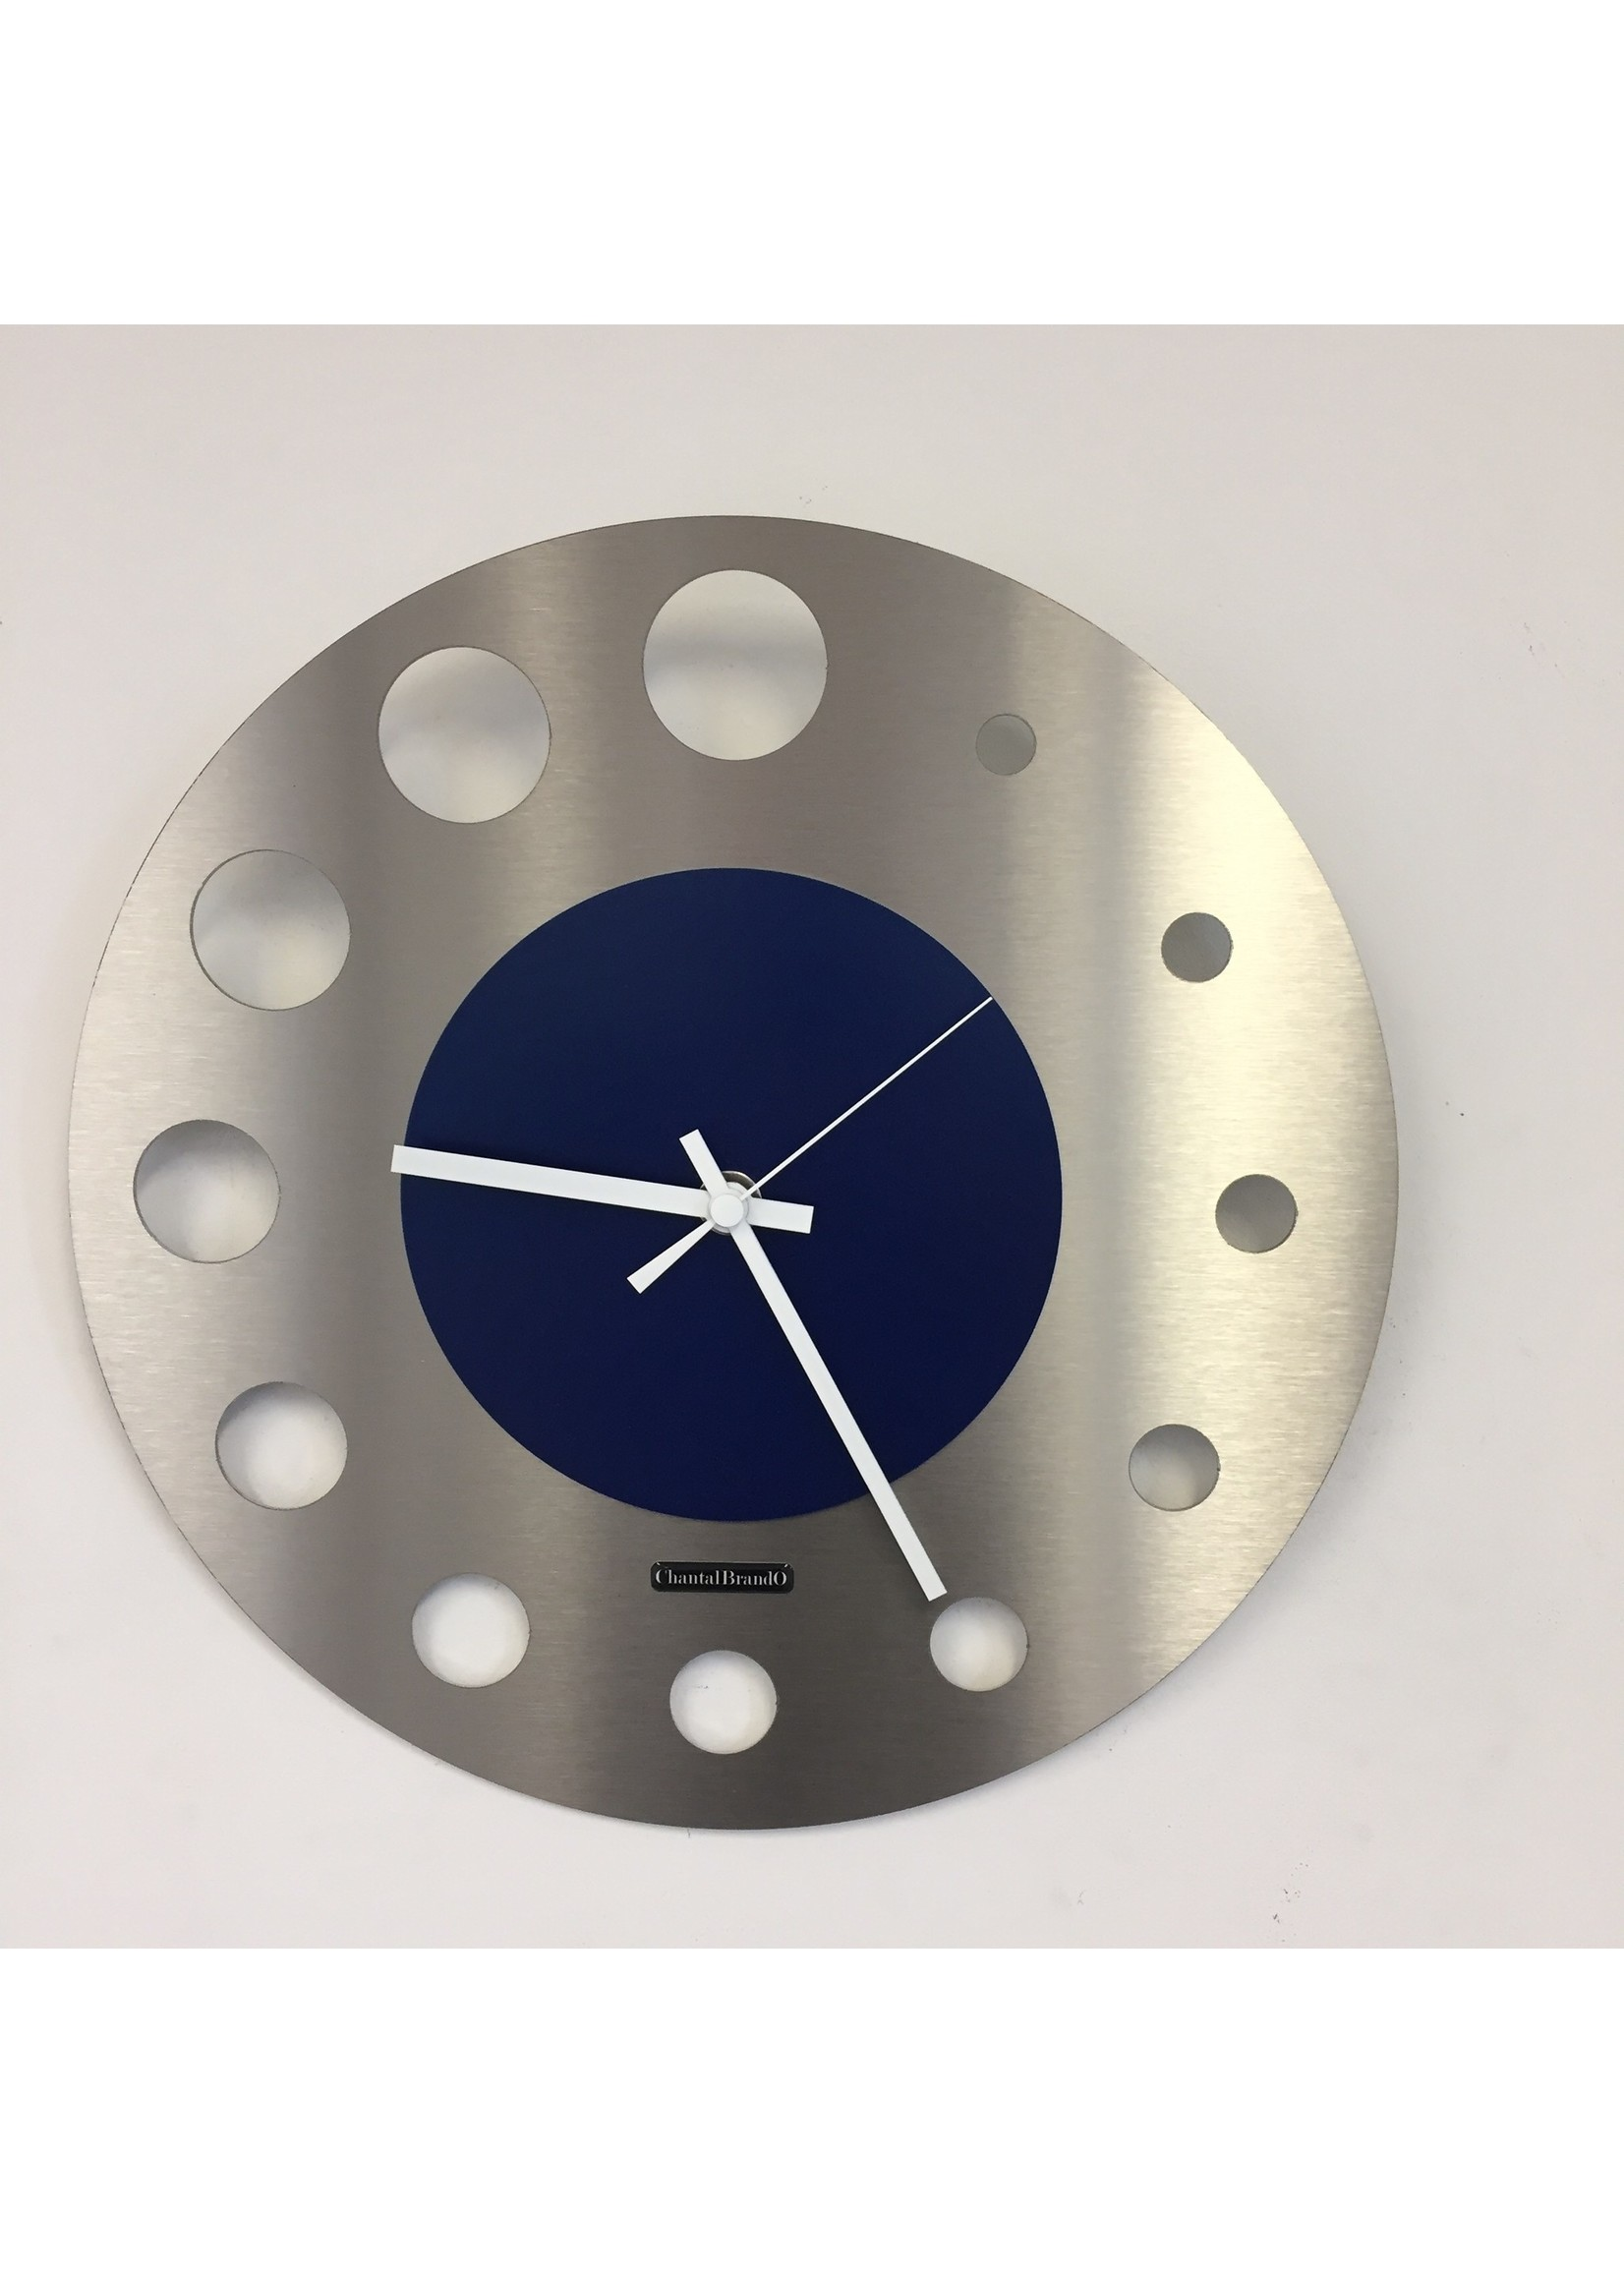 ChantalBrandO Wandklok JUNTE BRUSSEL ATOMIUM BlUE Modern Design